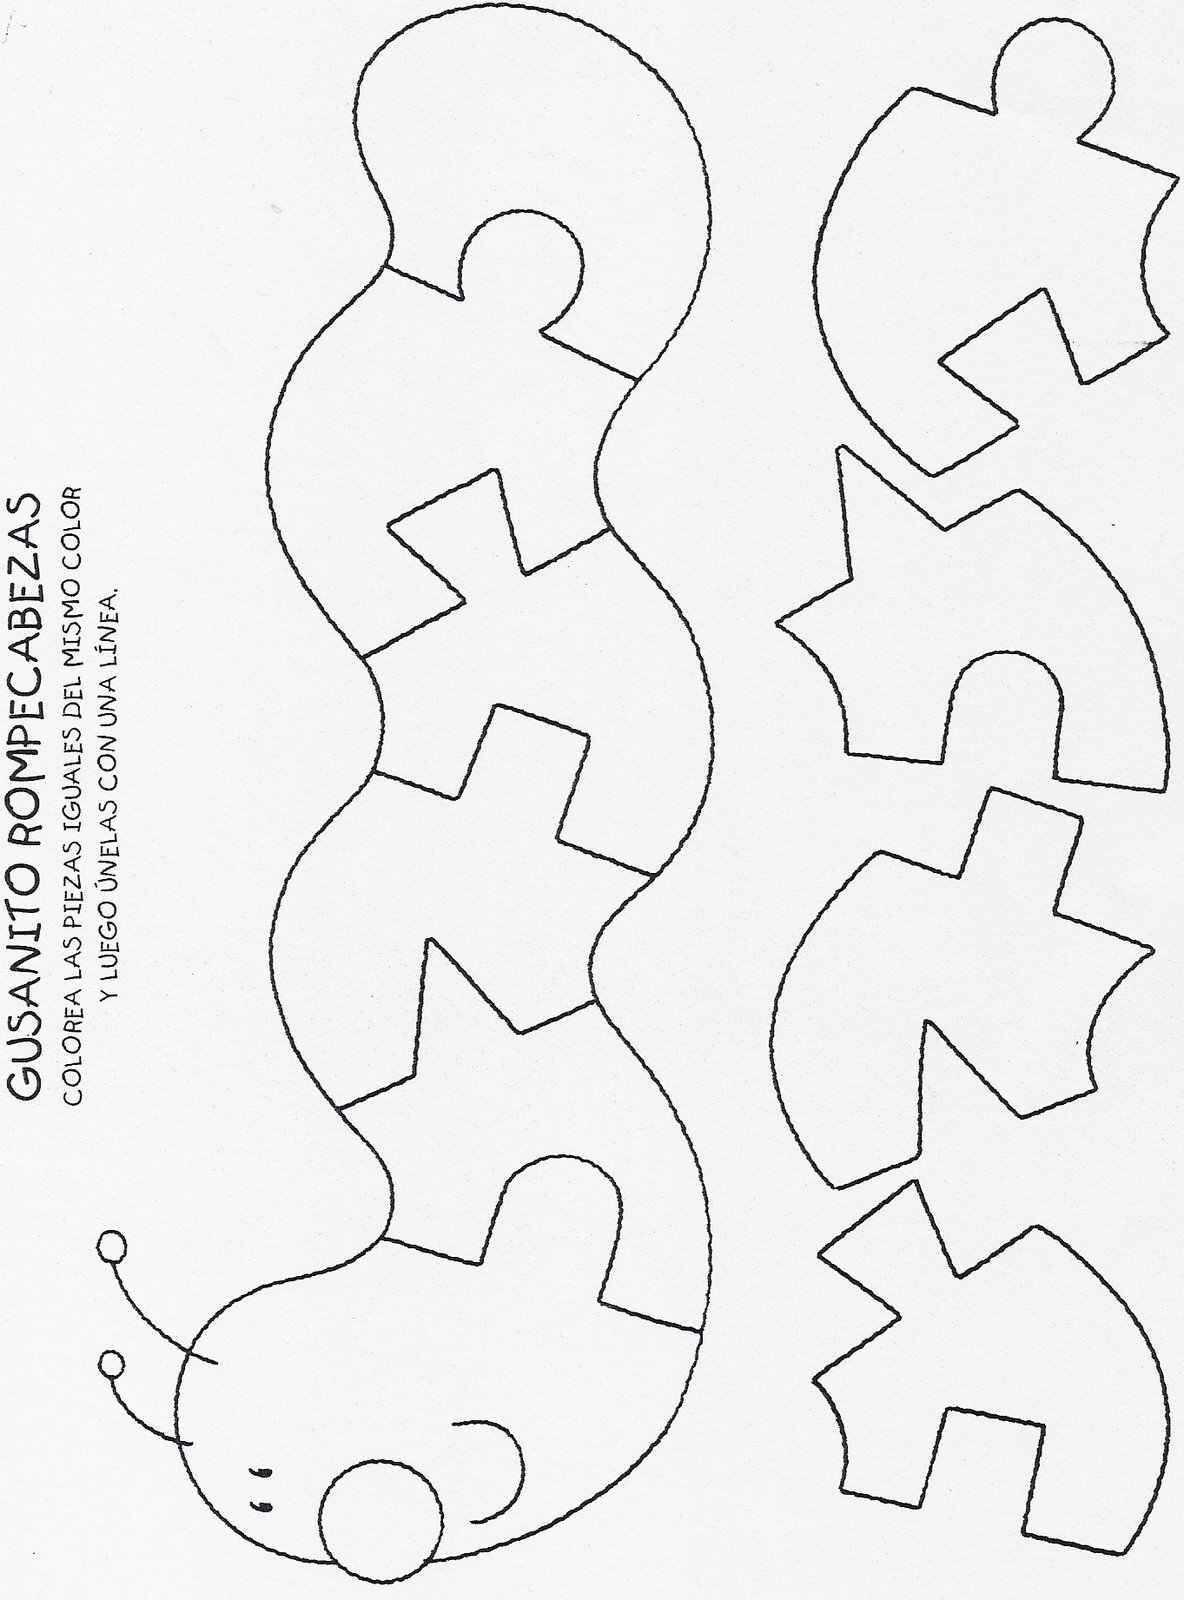 7c1f96f76cdc2245468ab4a5fa1adc6a Jpg 1184 1600 Ruhige Buch Muster Kreativ Bastelarbeiten